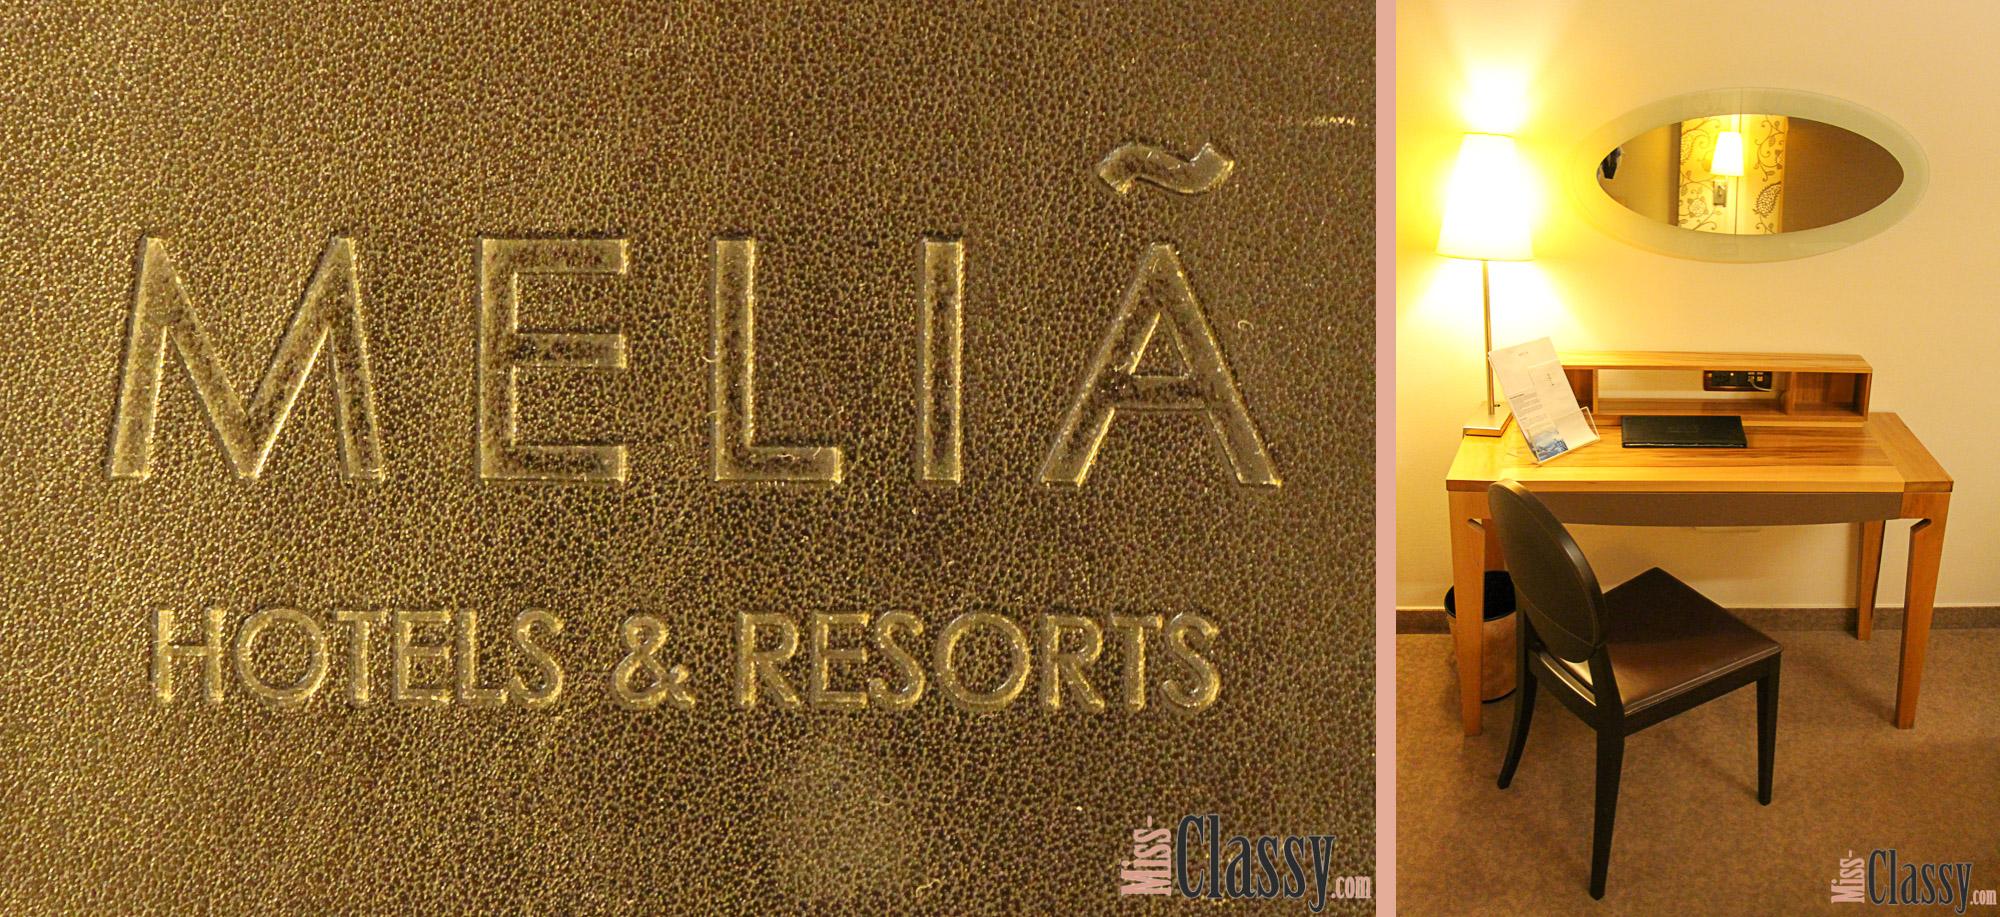 TRAVEL Melia Coral Umag, Miss Classy, miss-classy.com, Lifestyleblog, Lifestyleblogger, Lifestyleblog Graz, Travelblog, Travelblogger, Graz, Steiermark, Österreich, classy, beclassy, Reise, Travel, Wanderlust, Wayfarer, Umag, Kroatien, Istrien, Meer, Hotel, Hotelreview, 5 Sterne Hotel Umag, Wochenendtrip